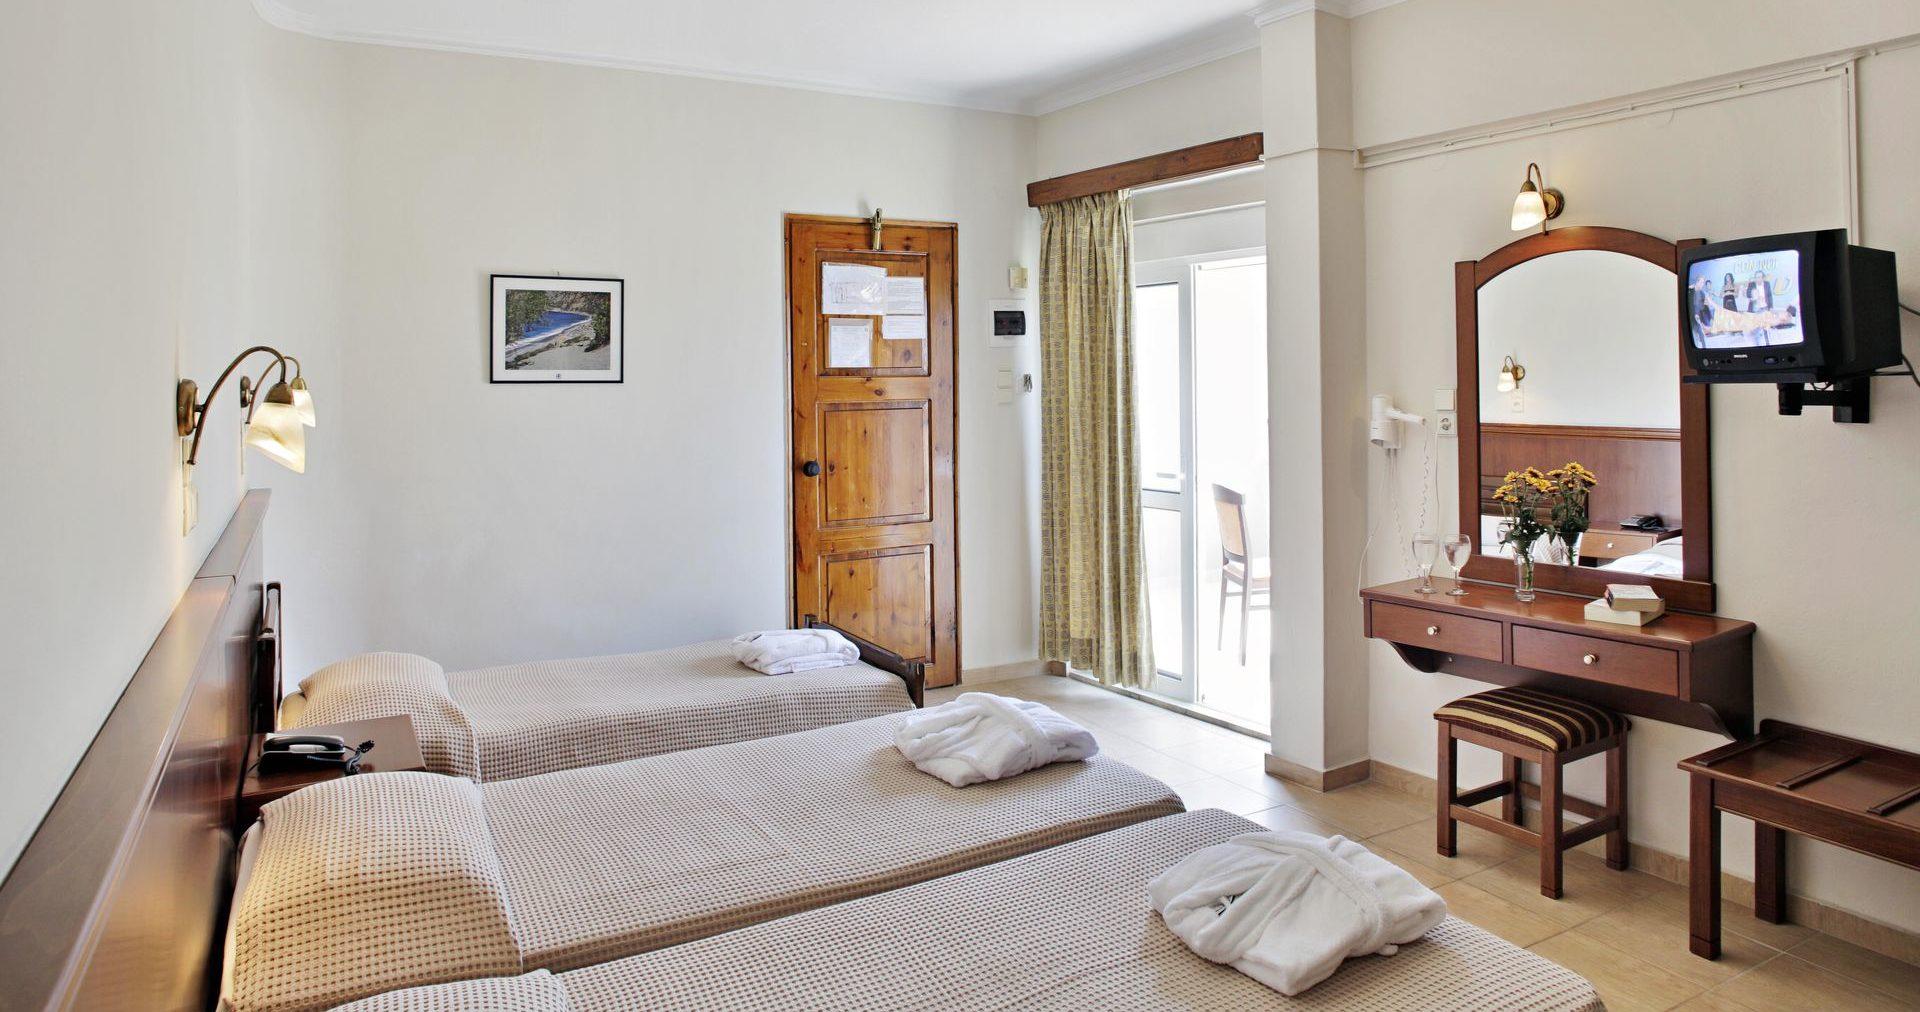 Economy Triple Room Arkadi Hotel Chania city center Crete